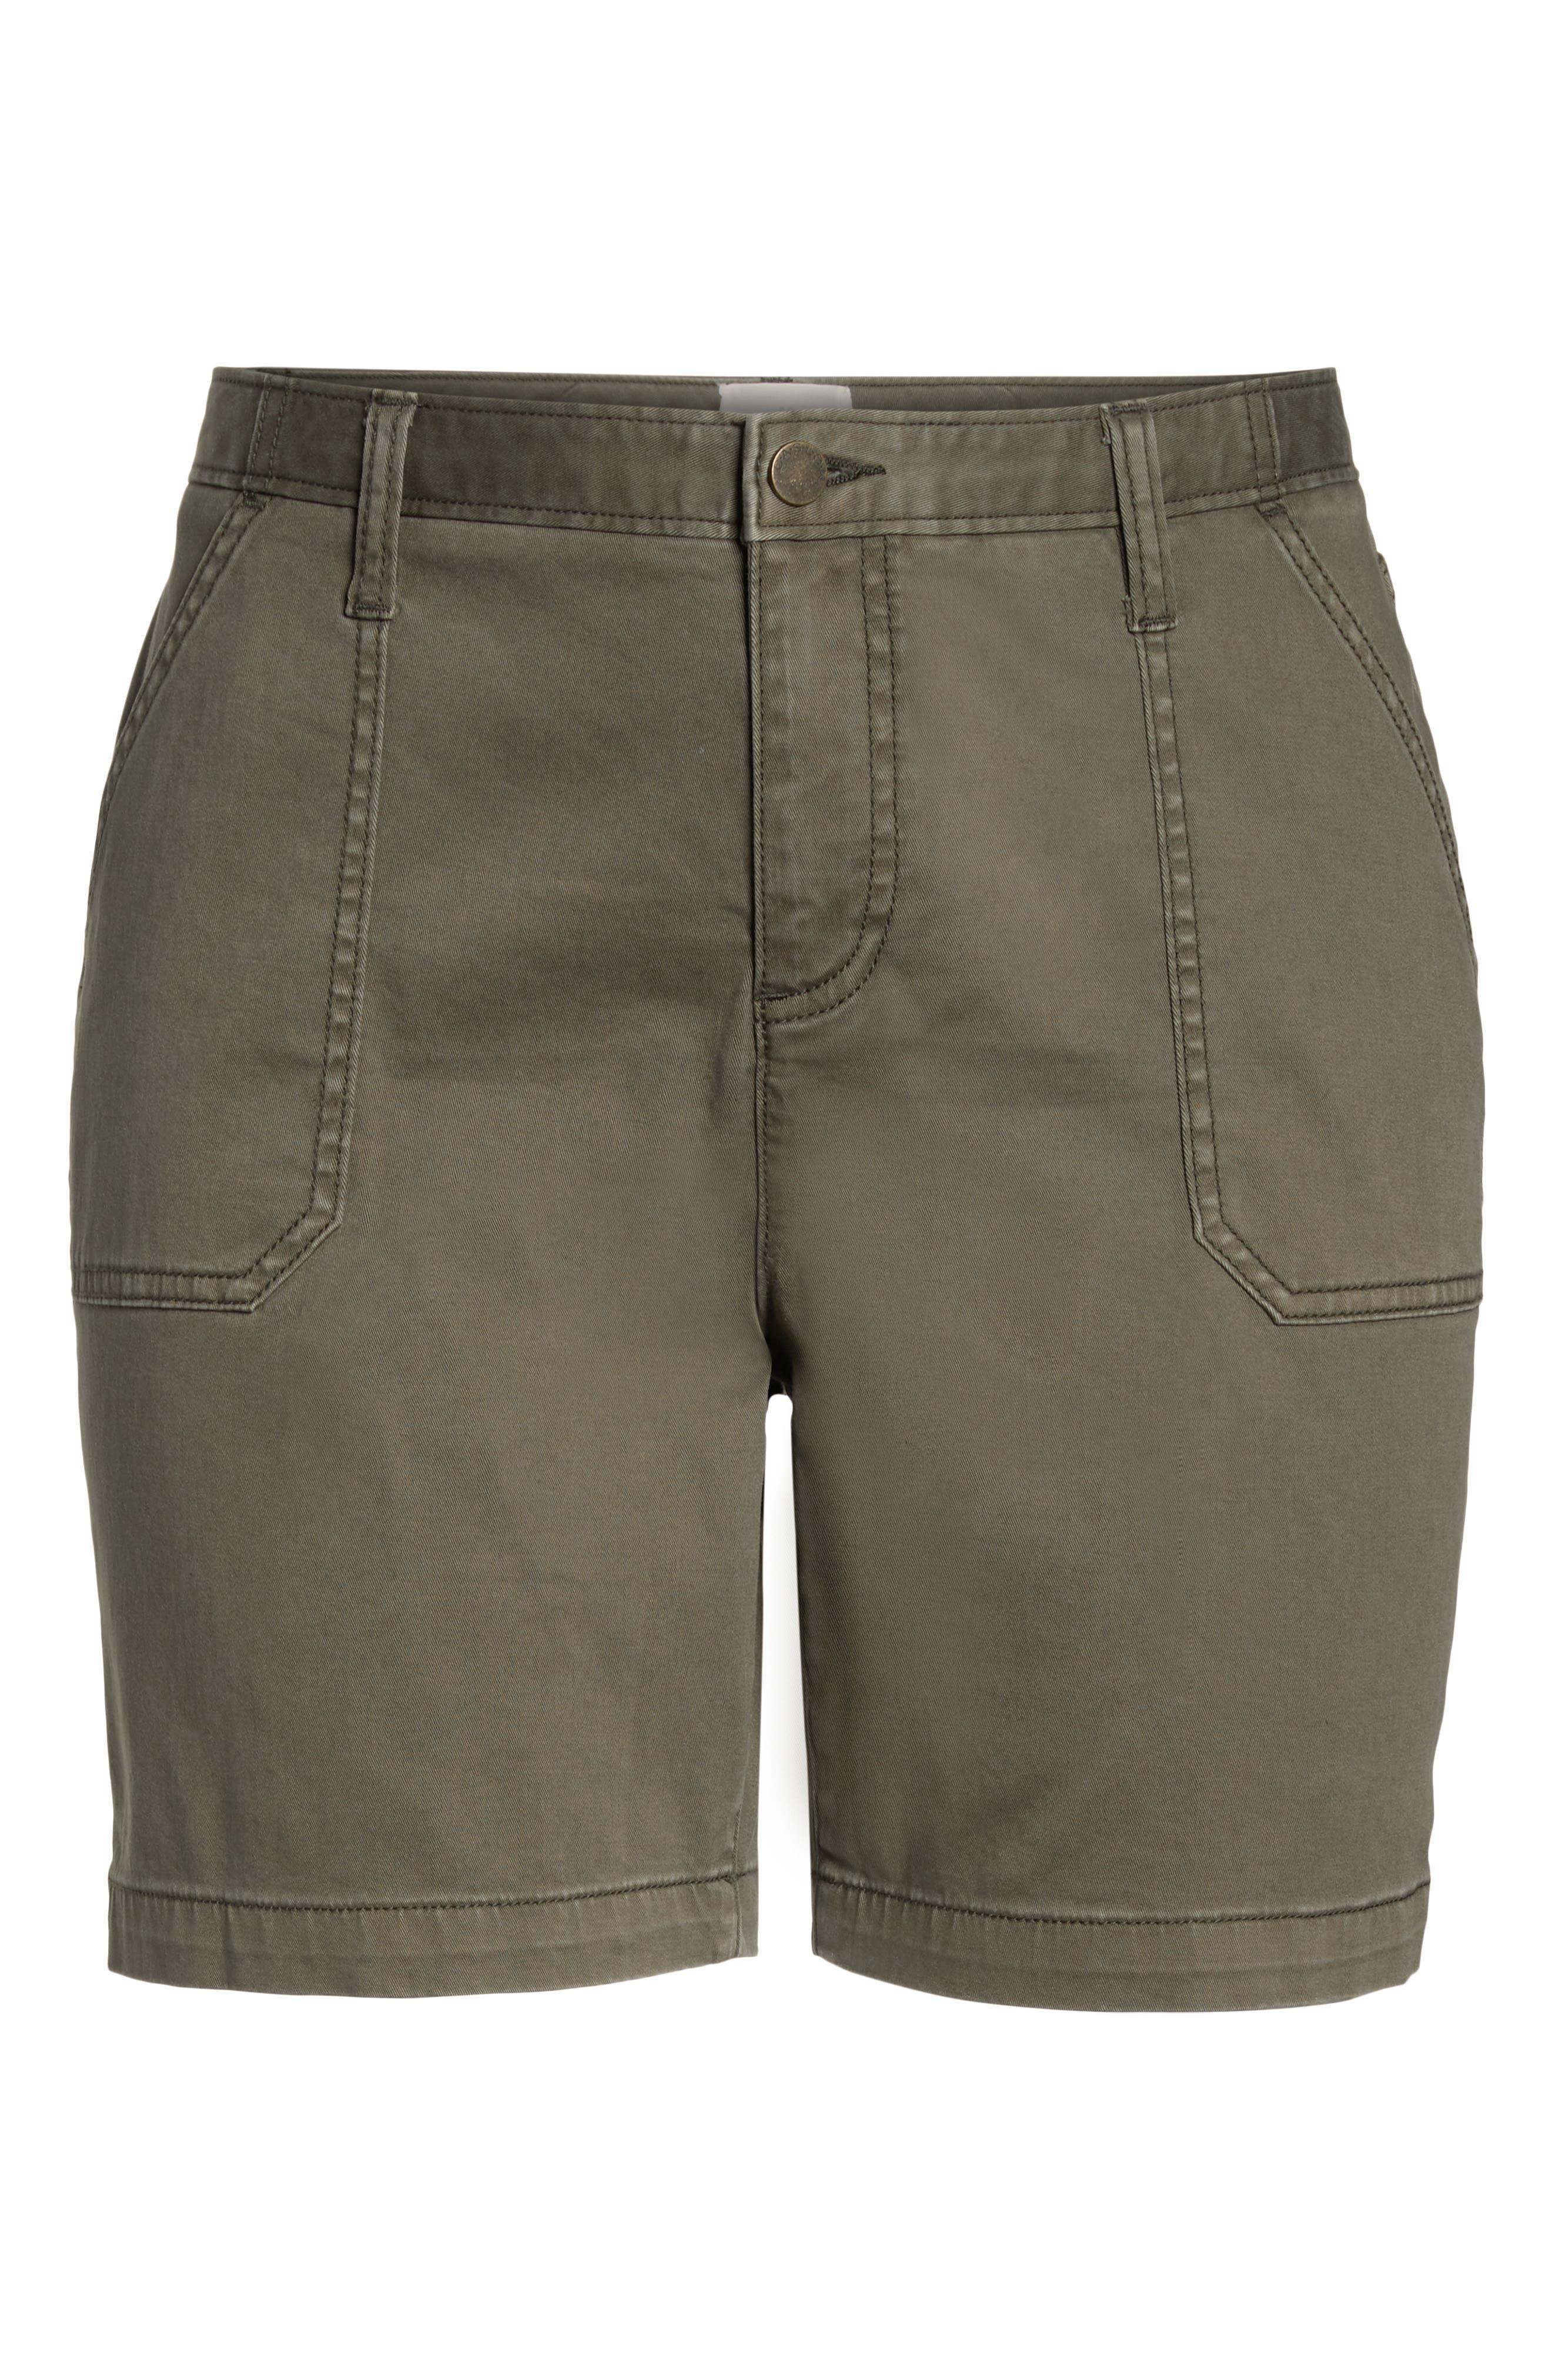 Utility Shorts,                             Alternate thumbnail 6, color,                             OLIVE SARMA